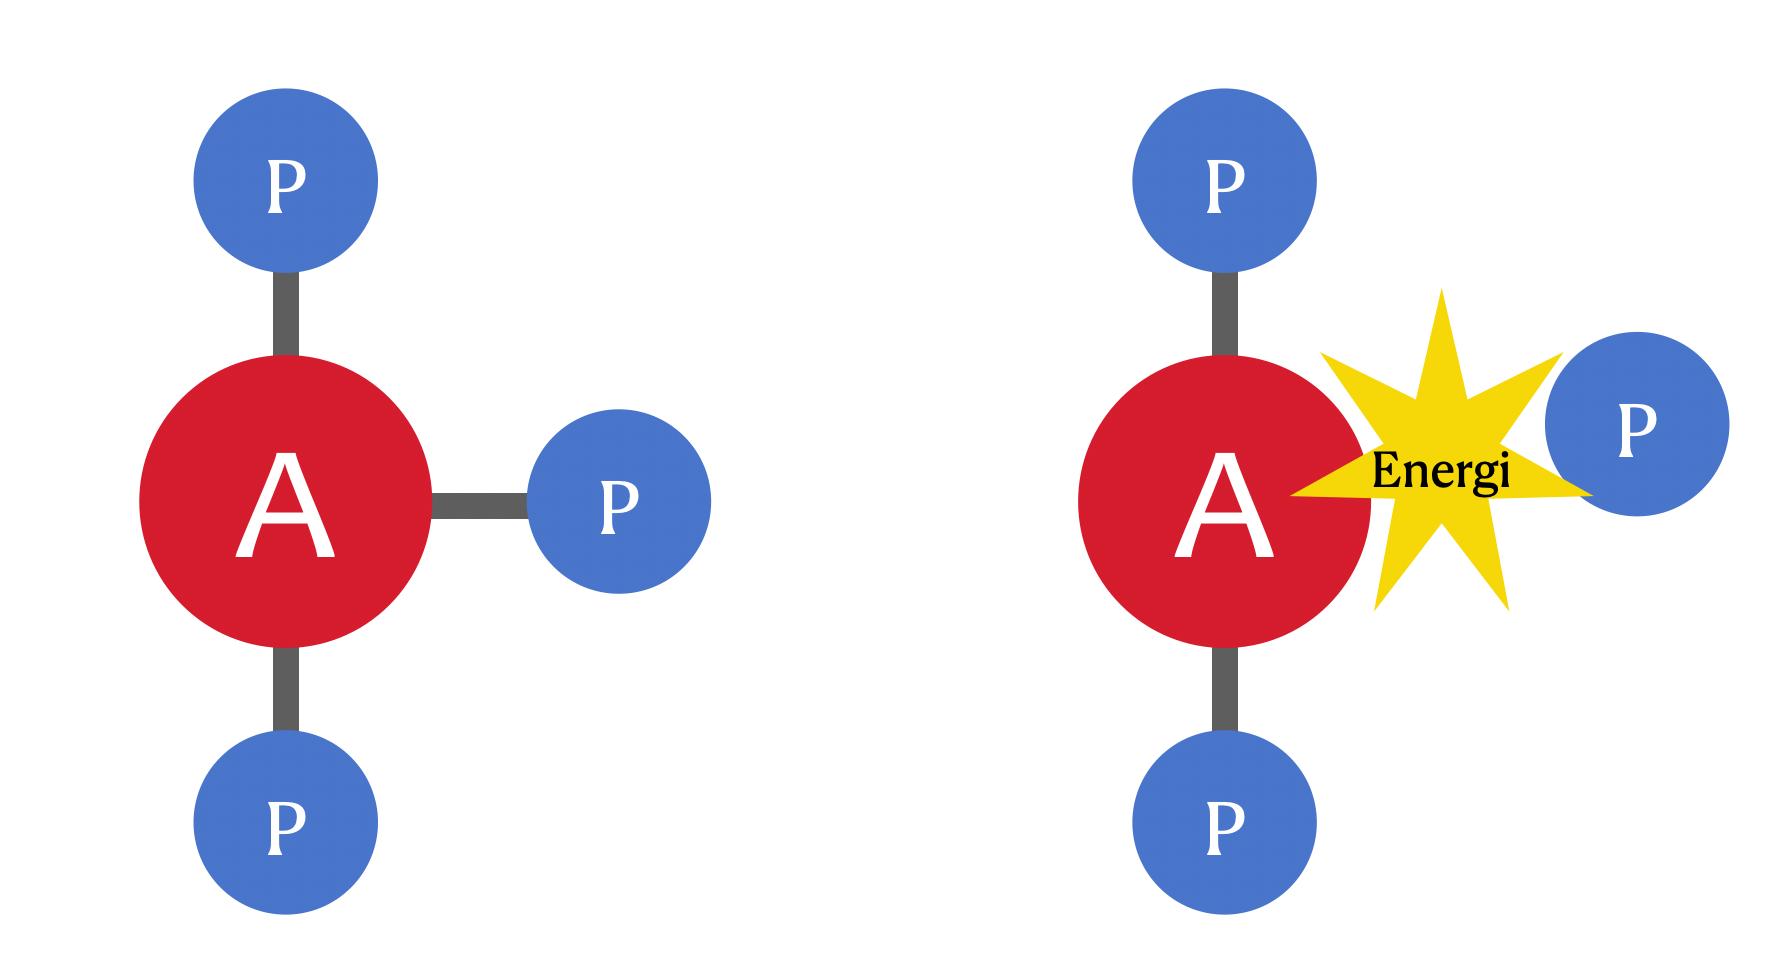 ATPADP